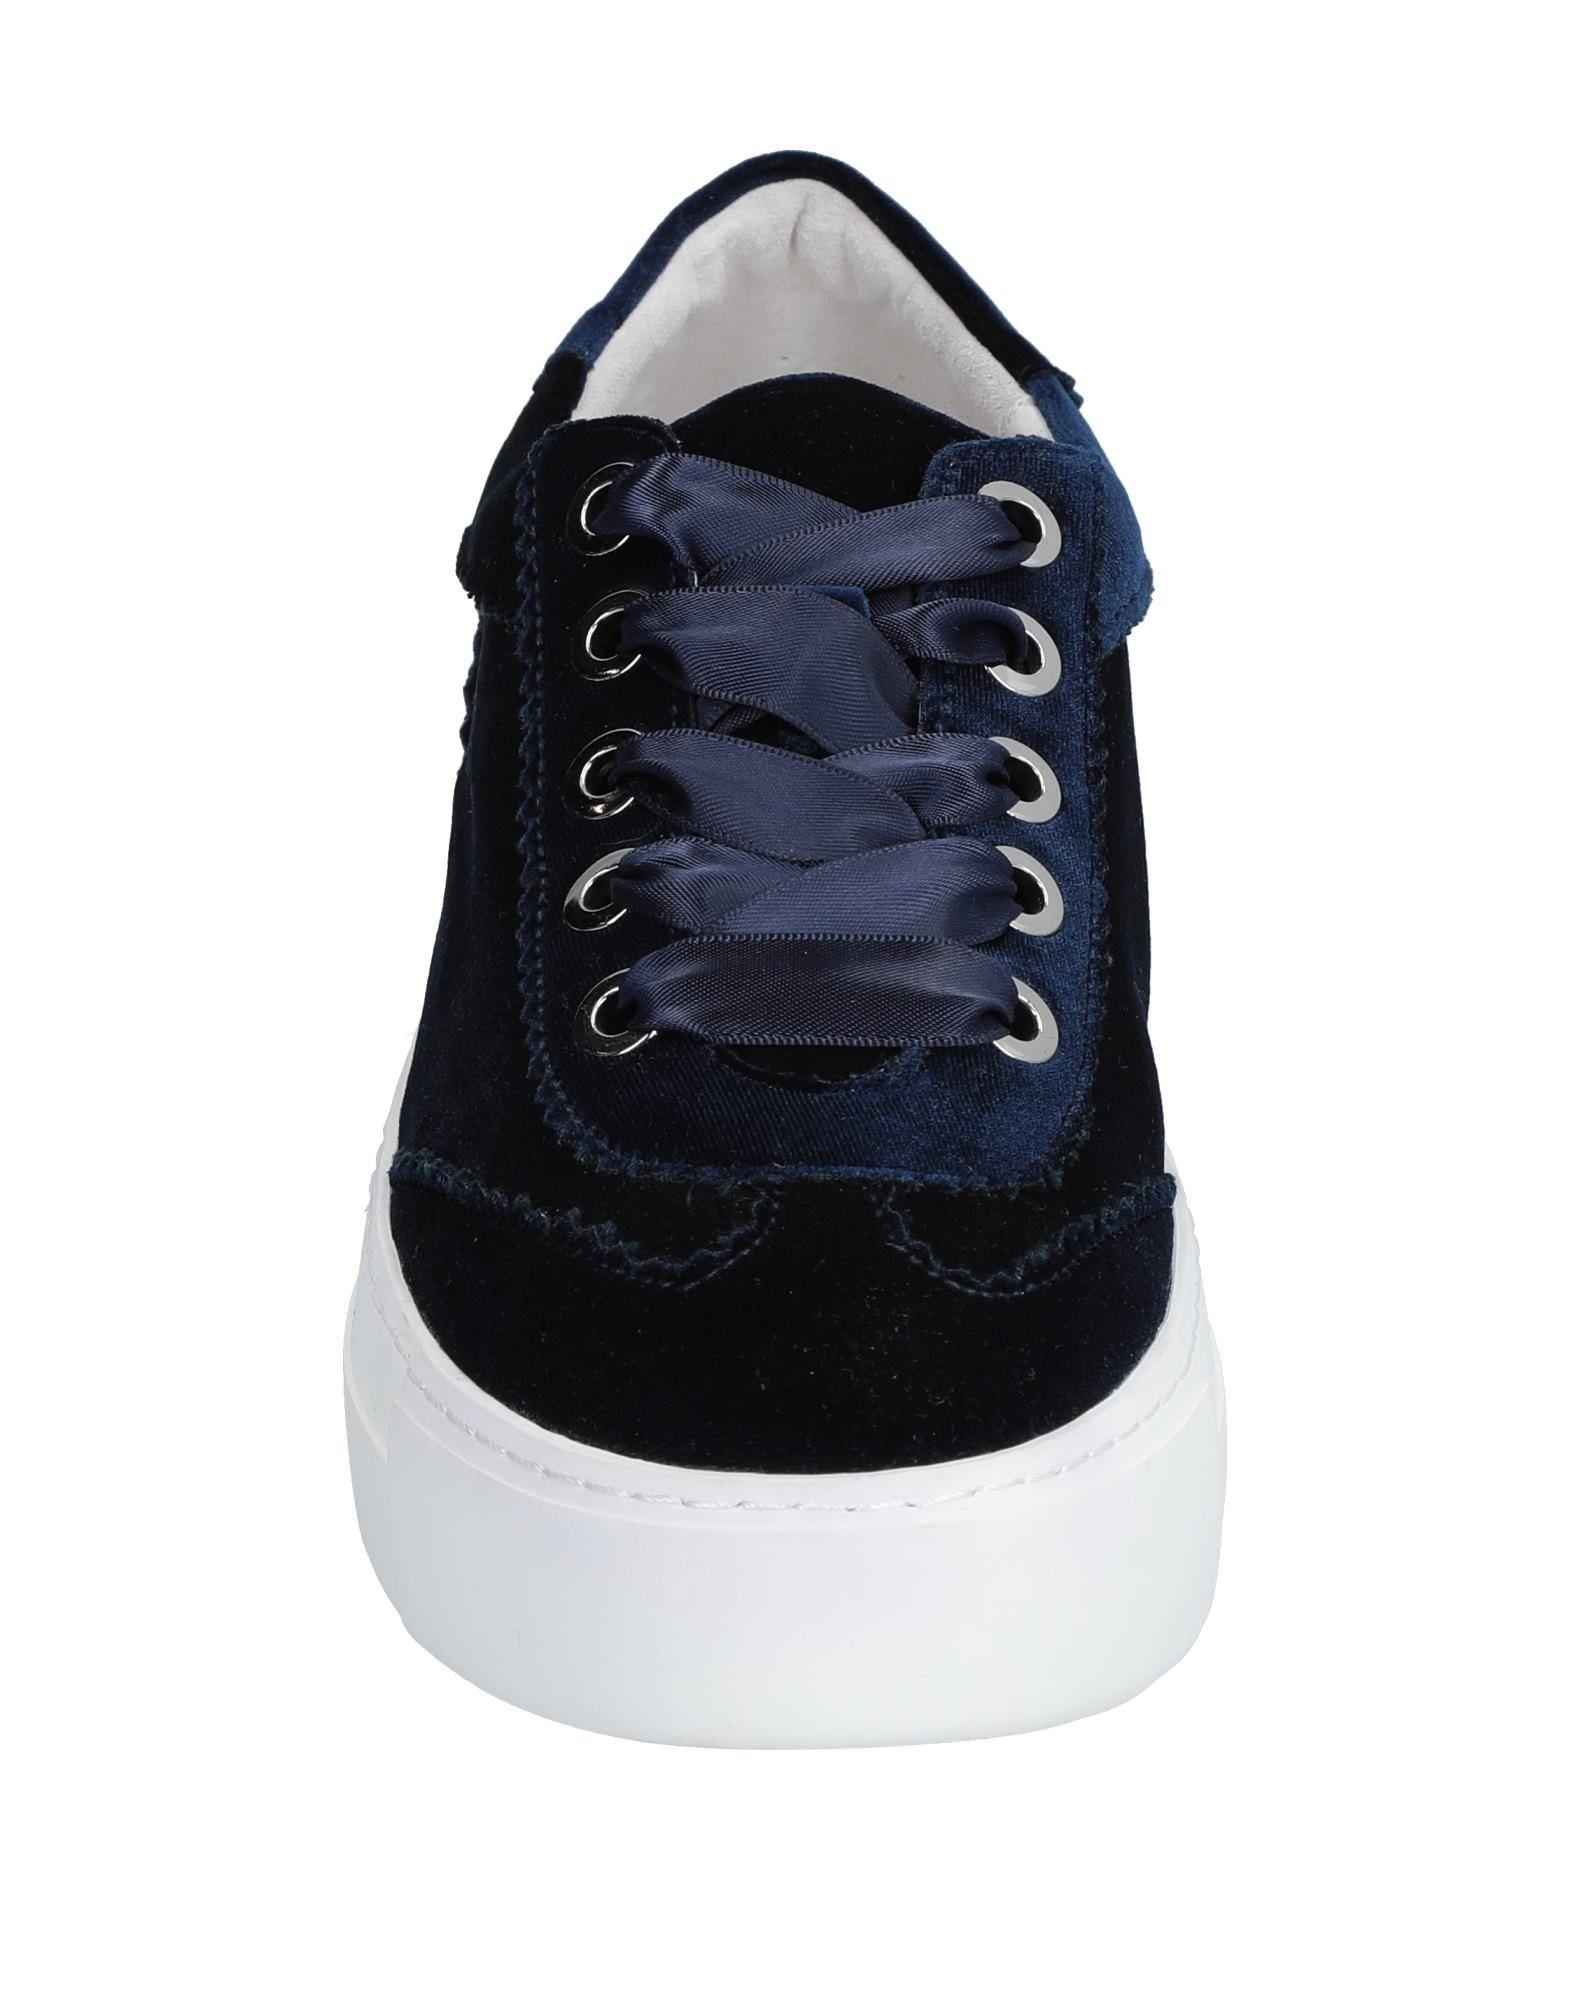 Emanuélle Vee Sneakers Damen  beliebte 11537834KE Gute Qualität beliebte  Schuhe 3d621f